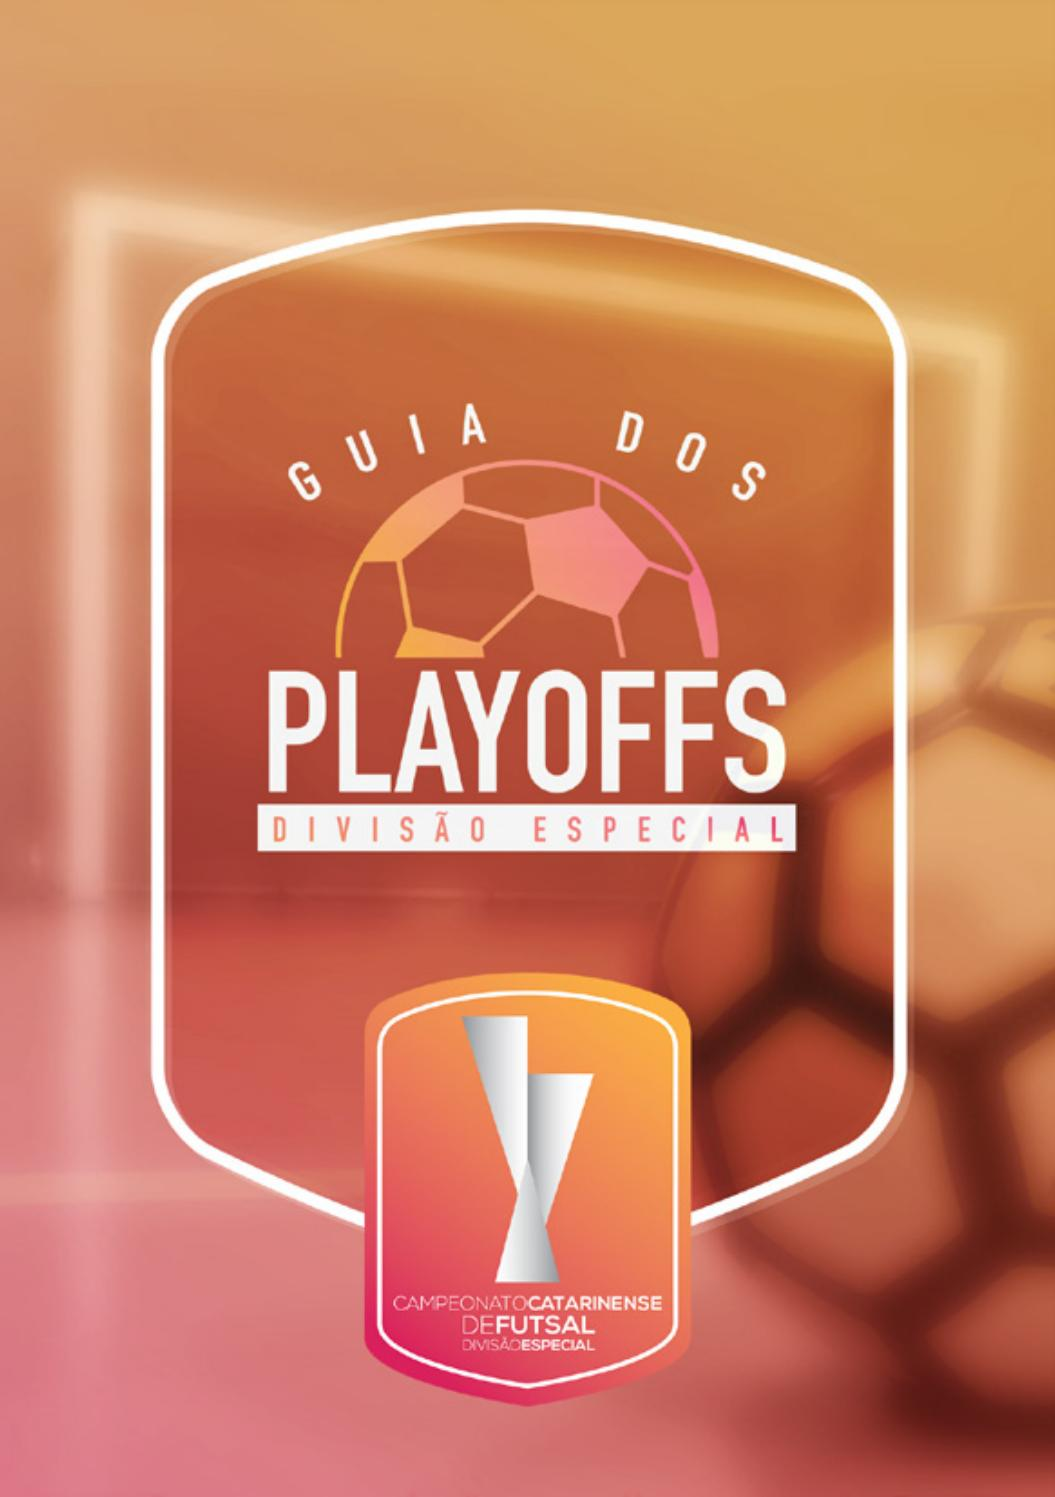 Guia Playoffs - Campeonato Catarinense de Futsal by Jonathan Rocha - issuu 07ab8747ae20f